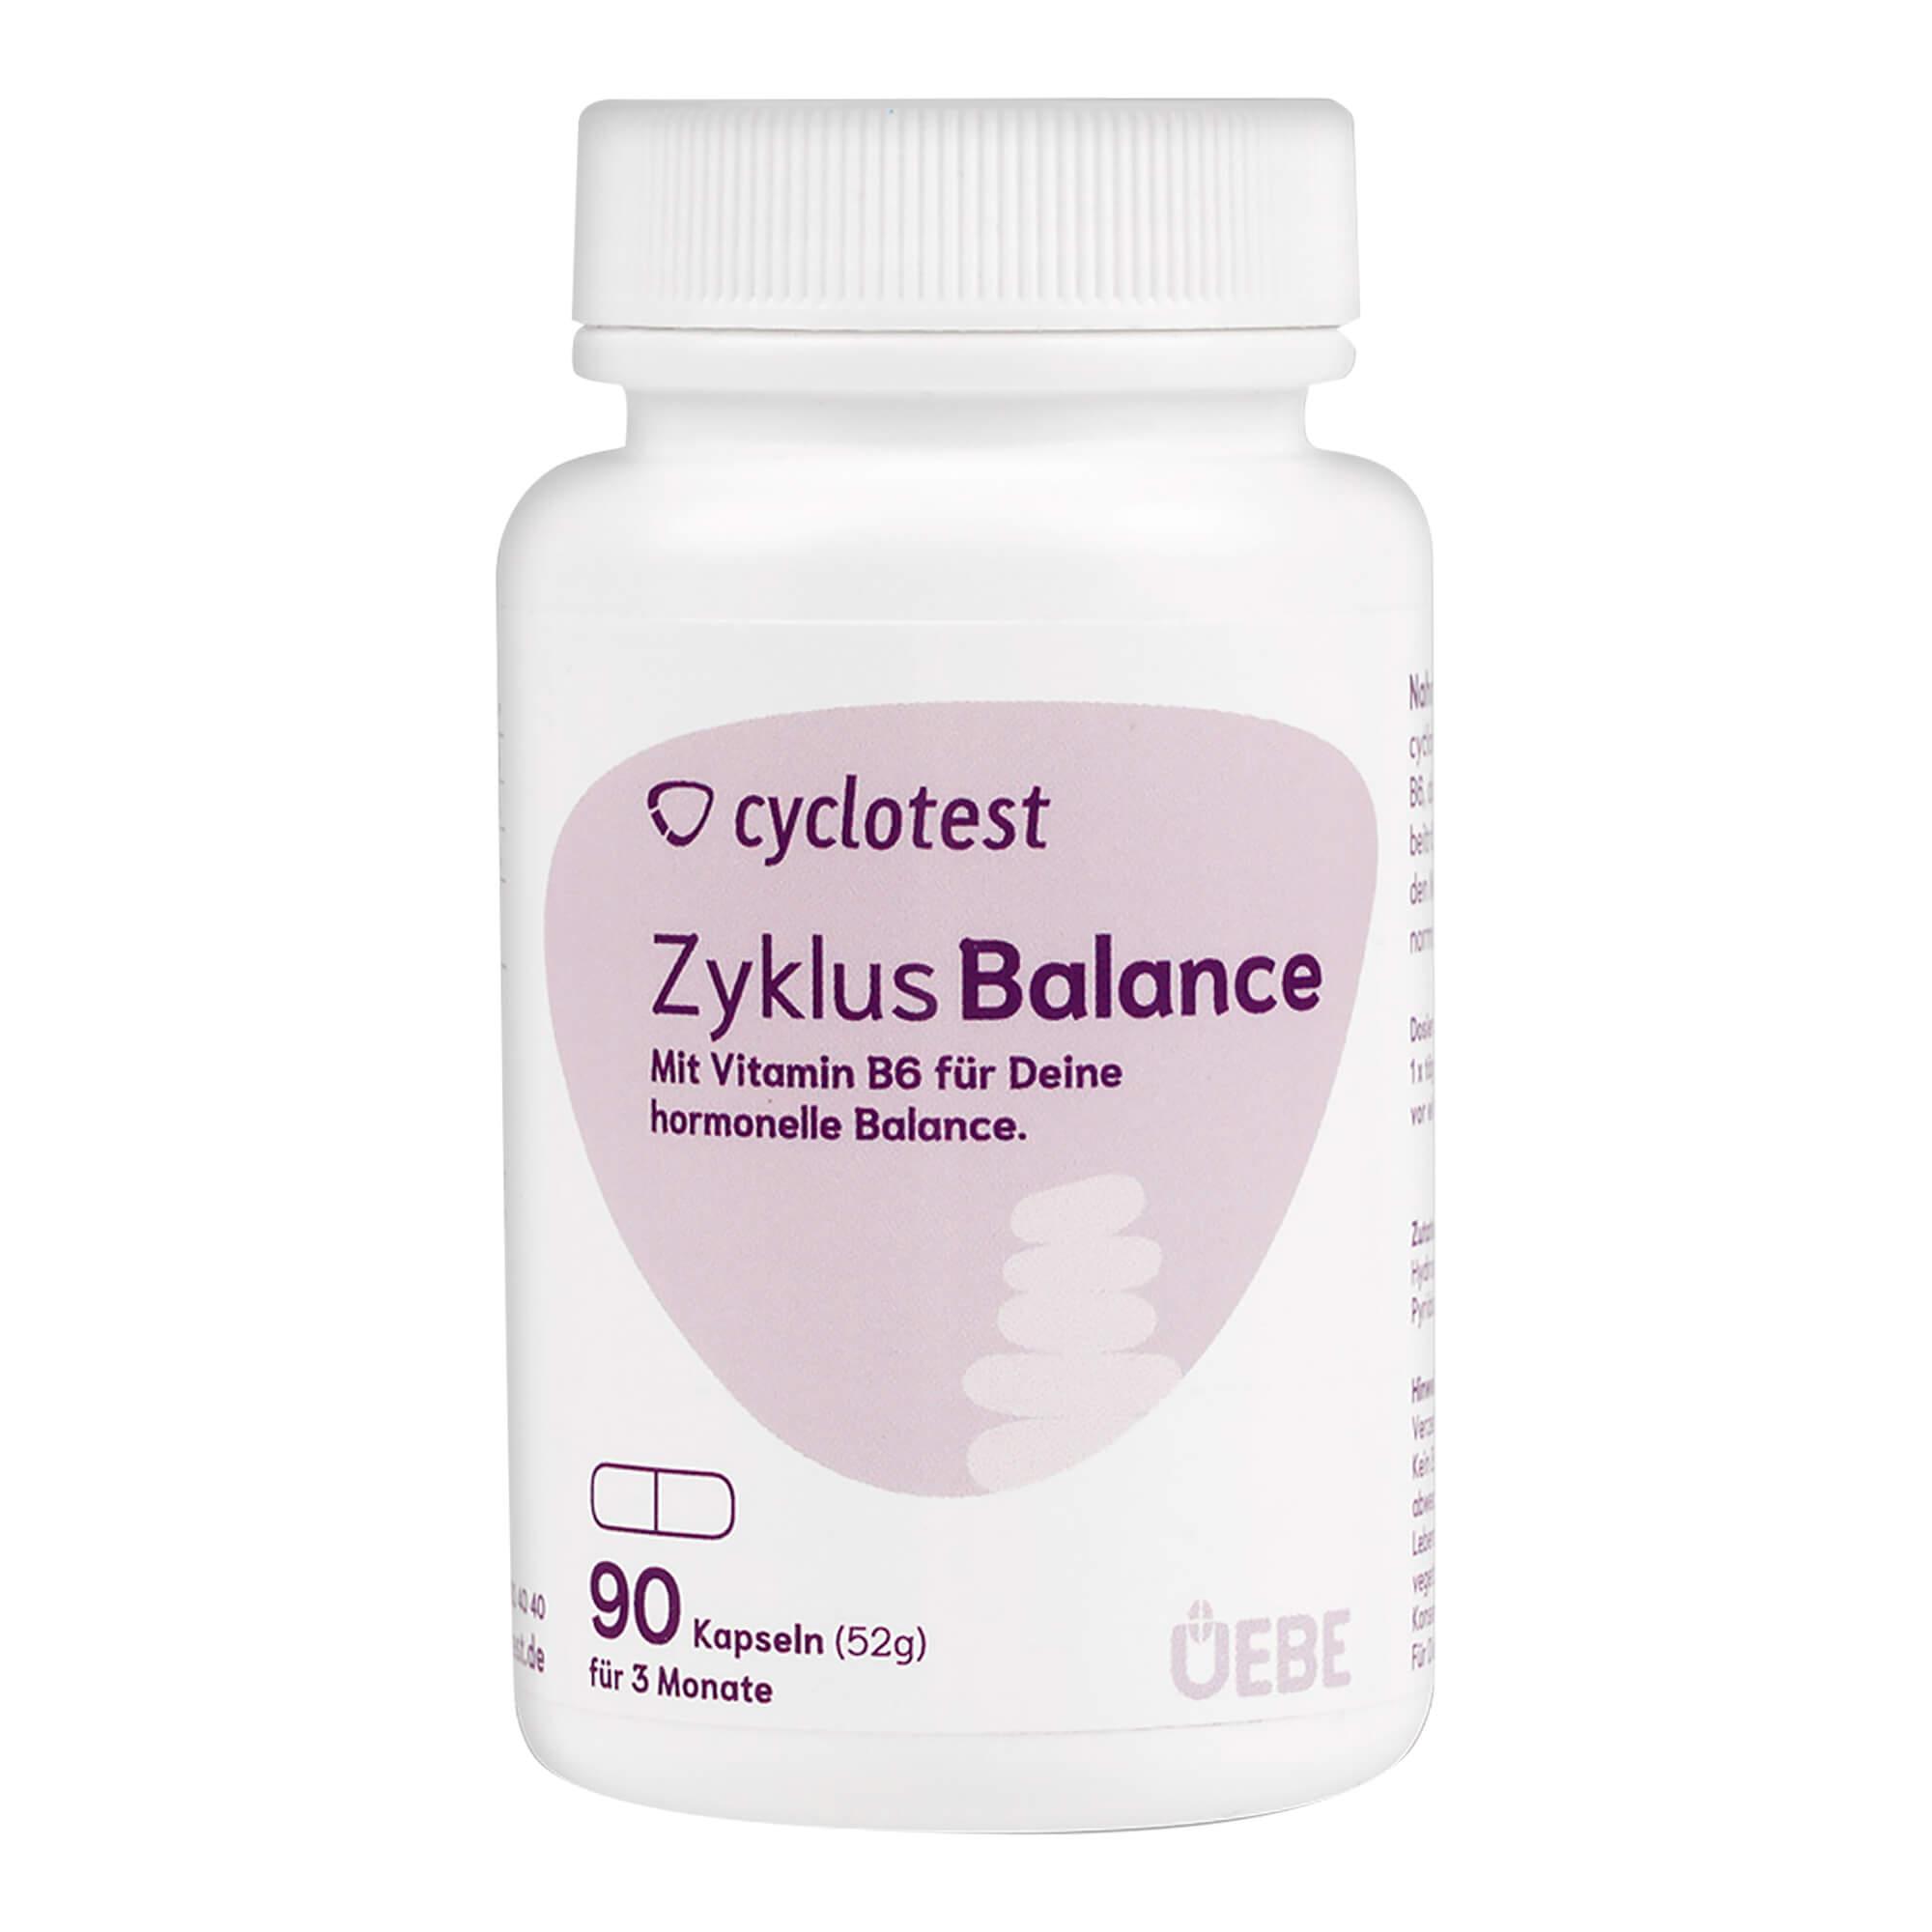 Cyclotest Zyklus-Balance